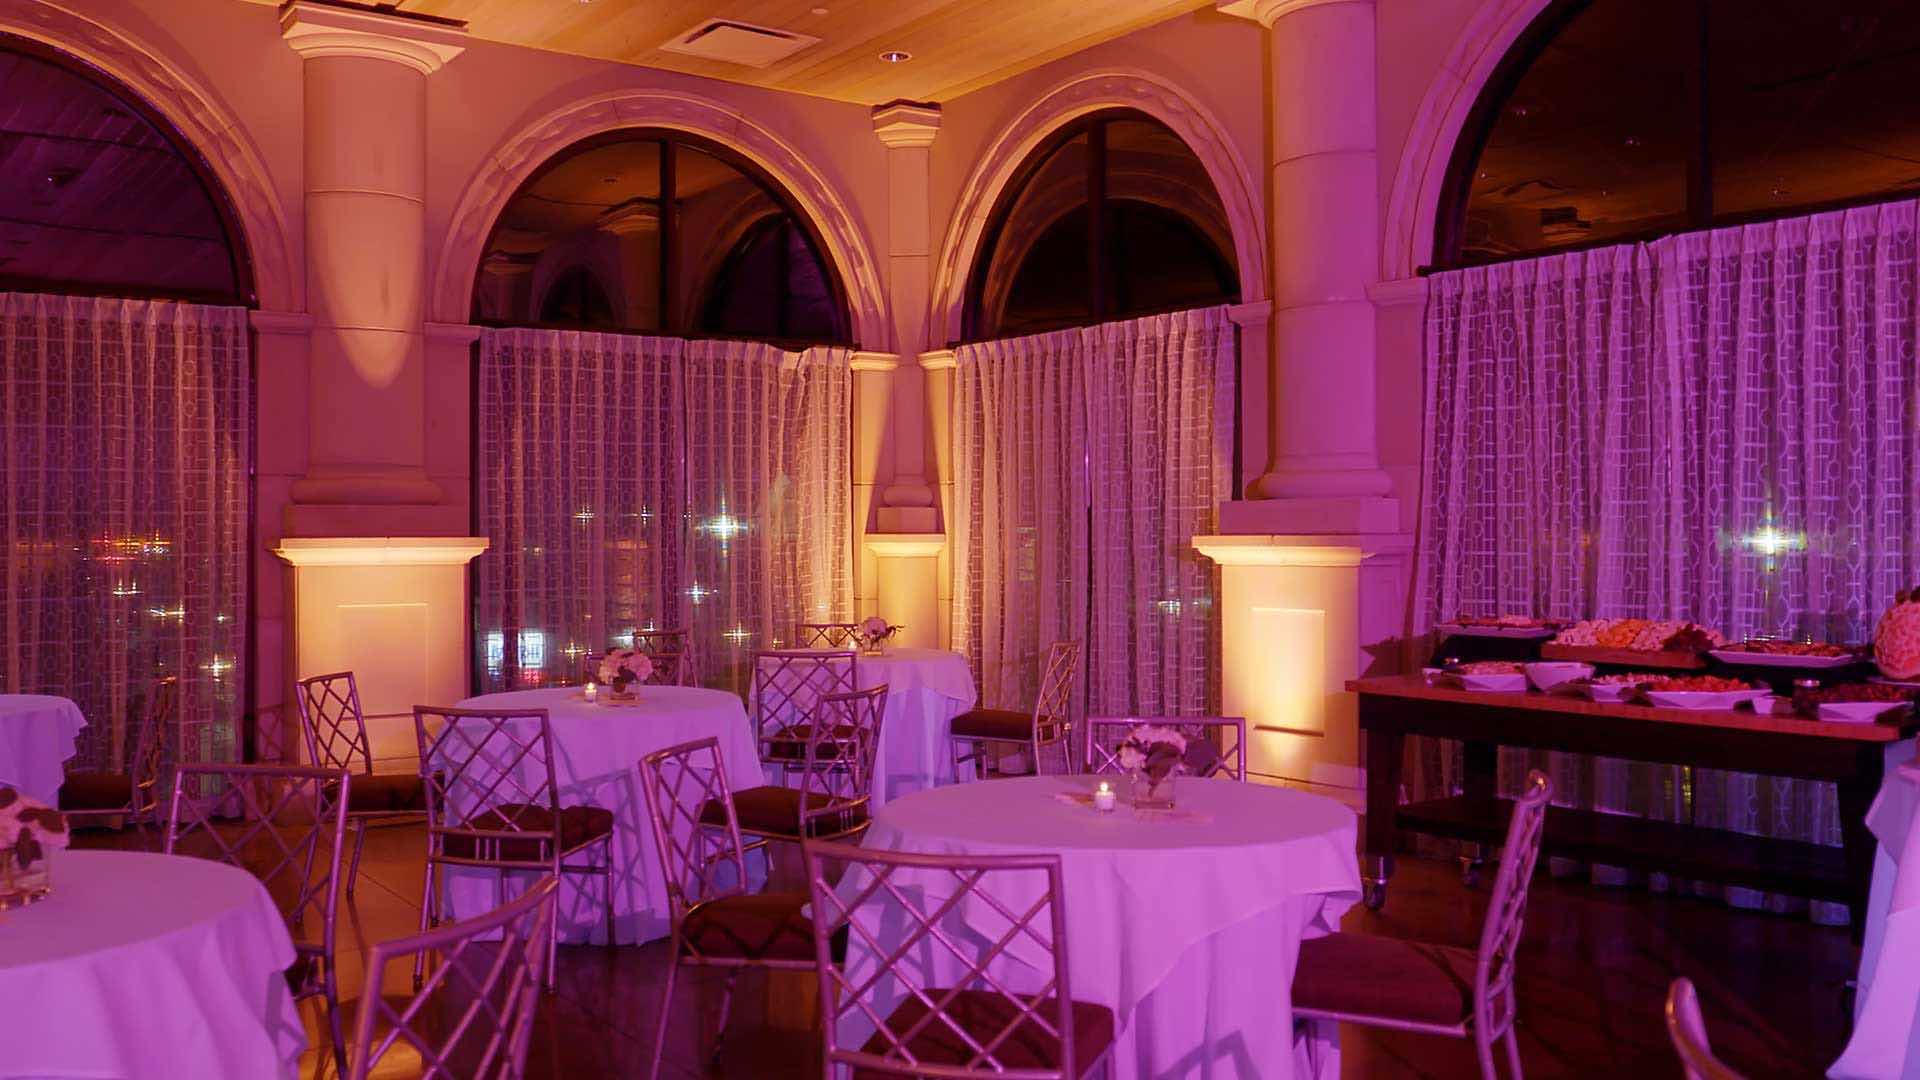 The Terrace Room of The Sea Star Ballroom